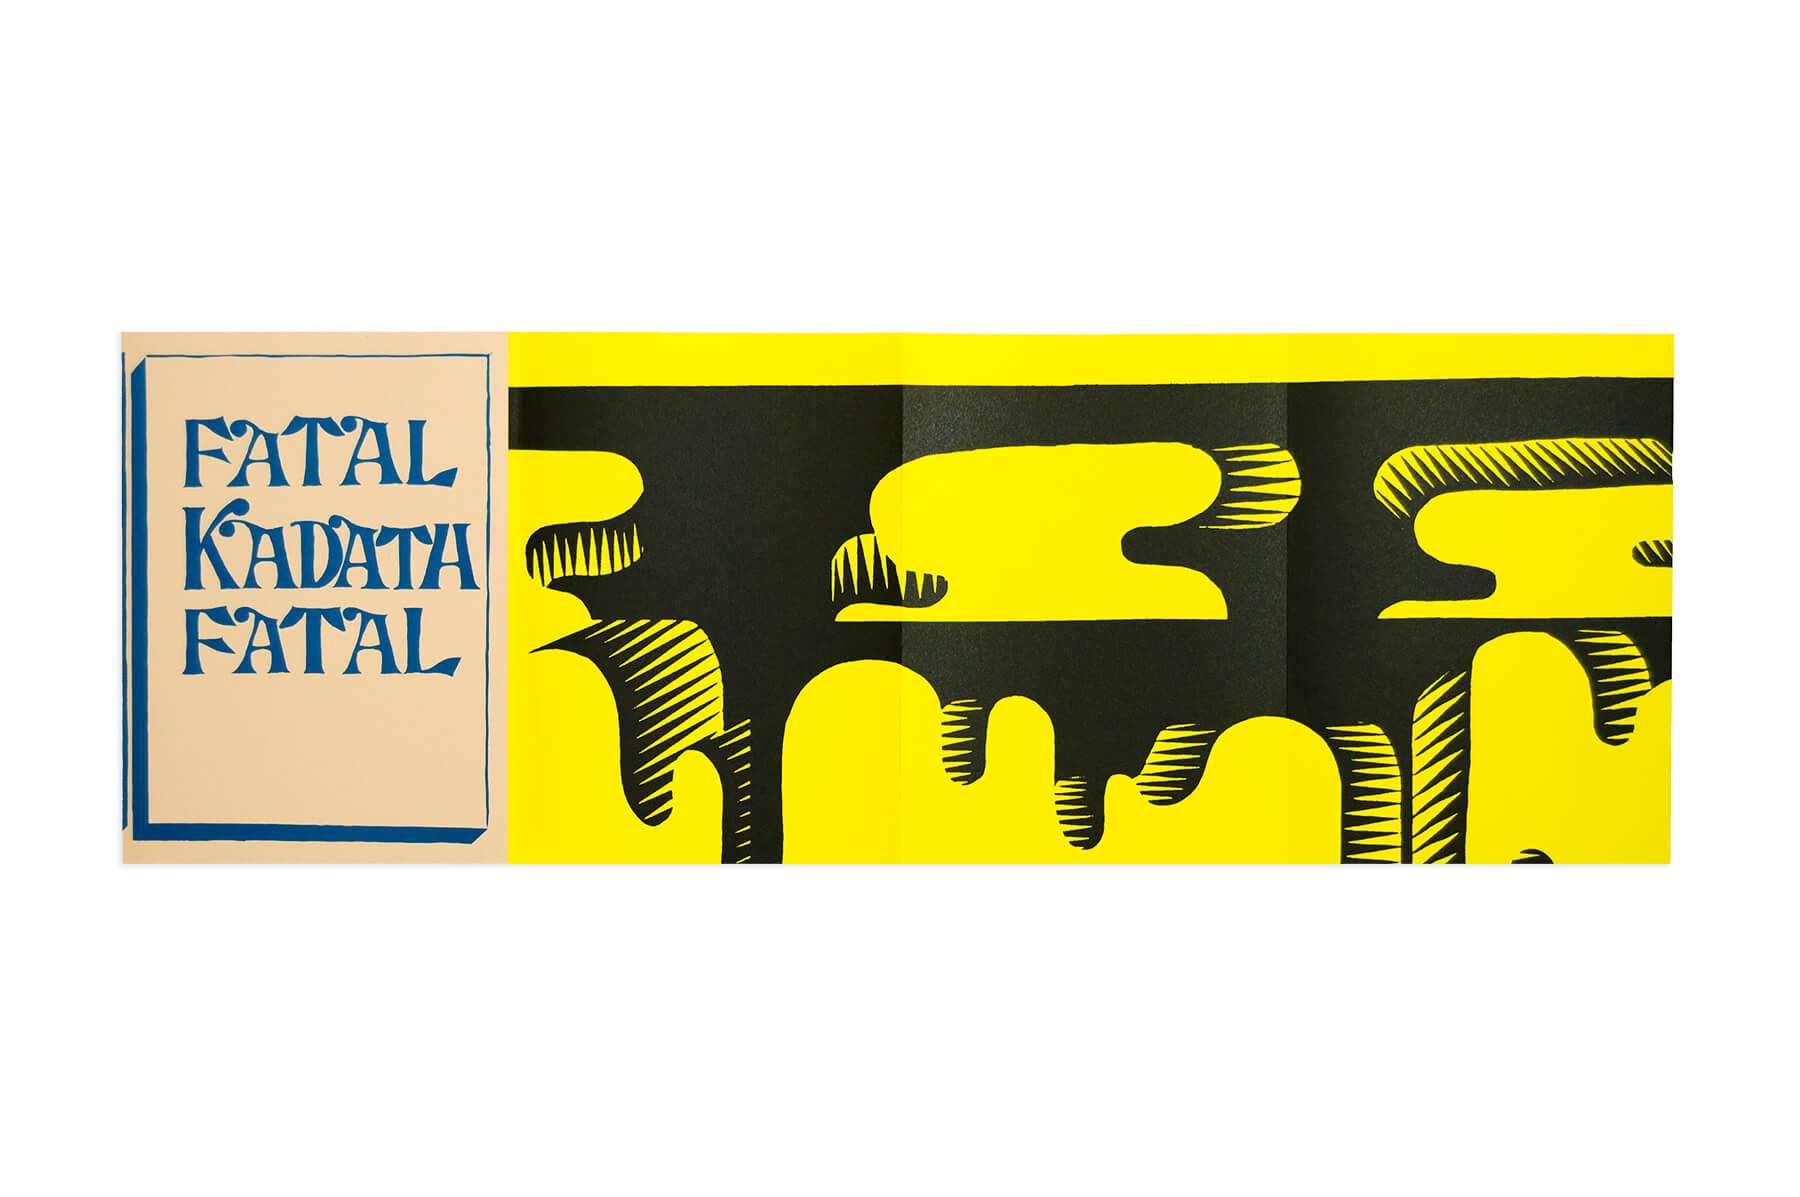 Product image of Fatal Kadath Fatal